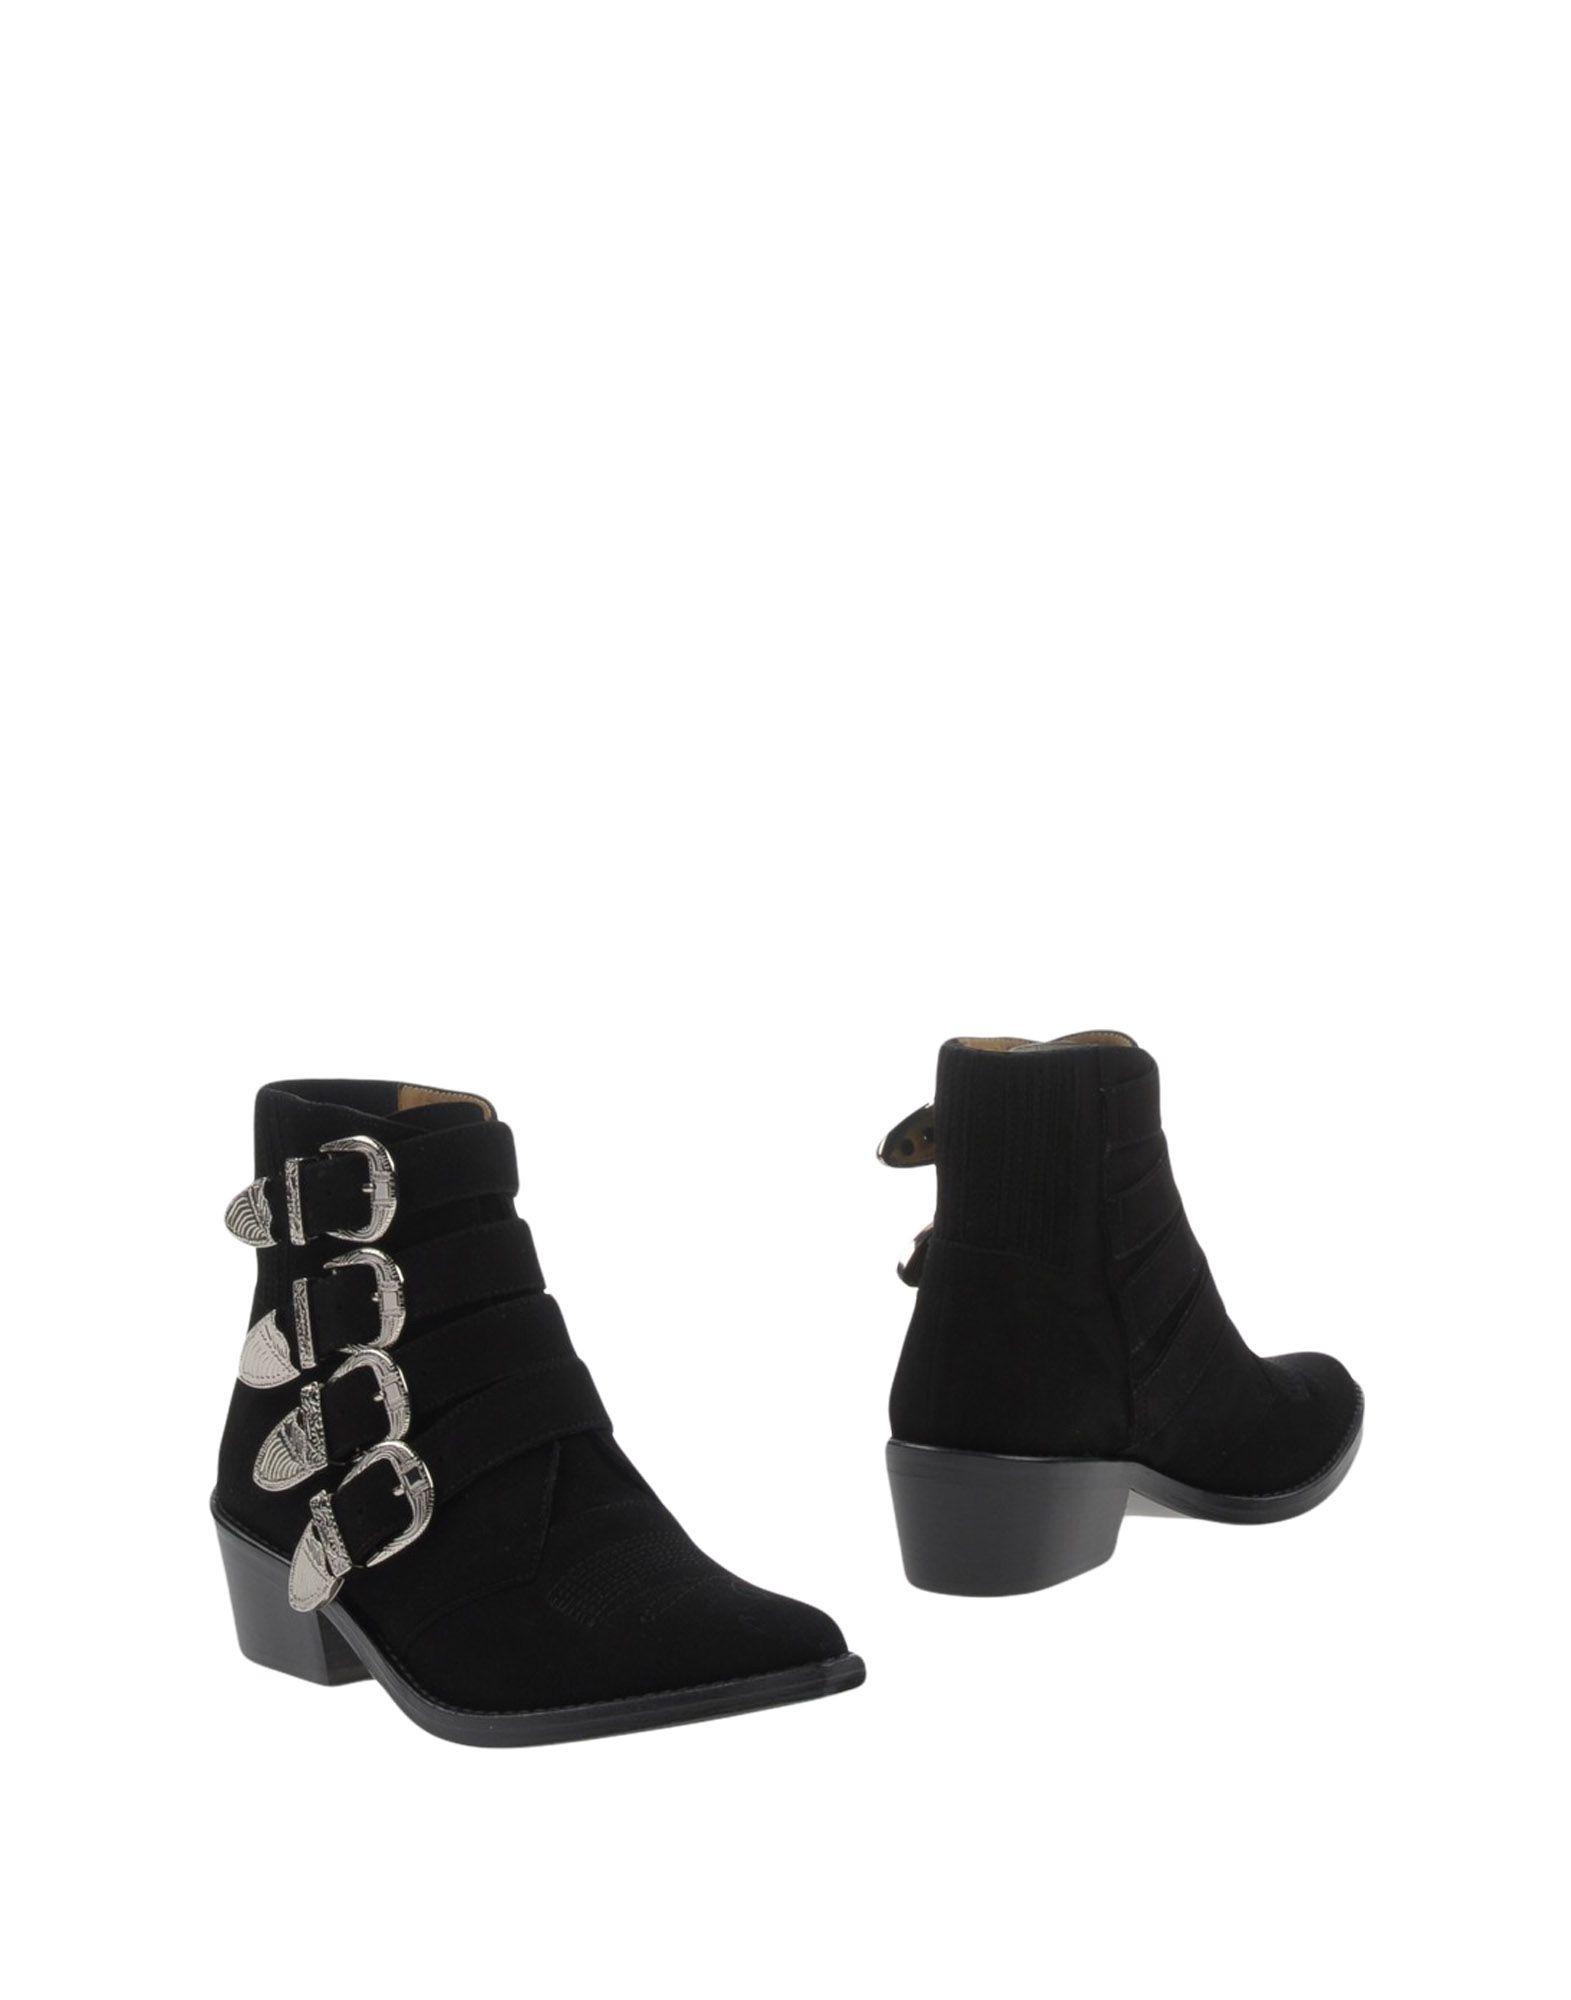 Toga Pulla Stiefelette Damen strapazierfähige  11358469JPGut aussehende strapazierfähige Damen Schuhe 20ca90